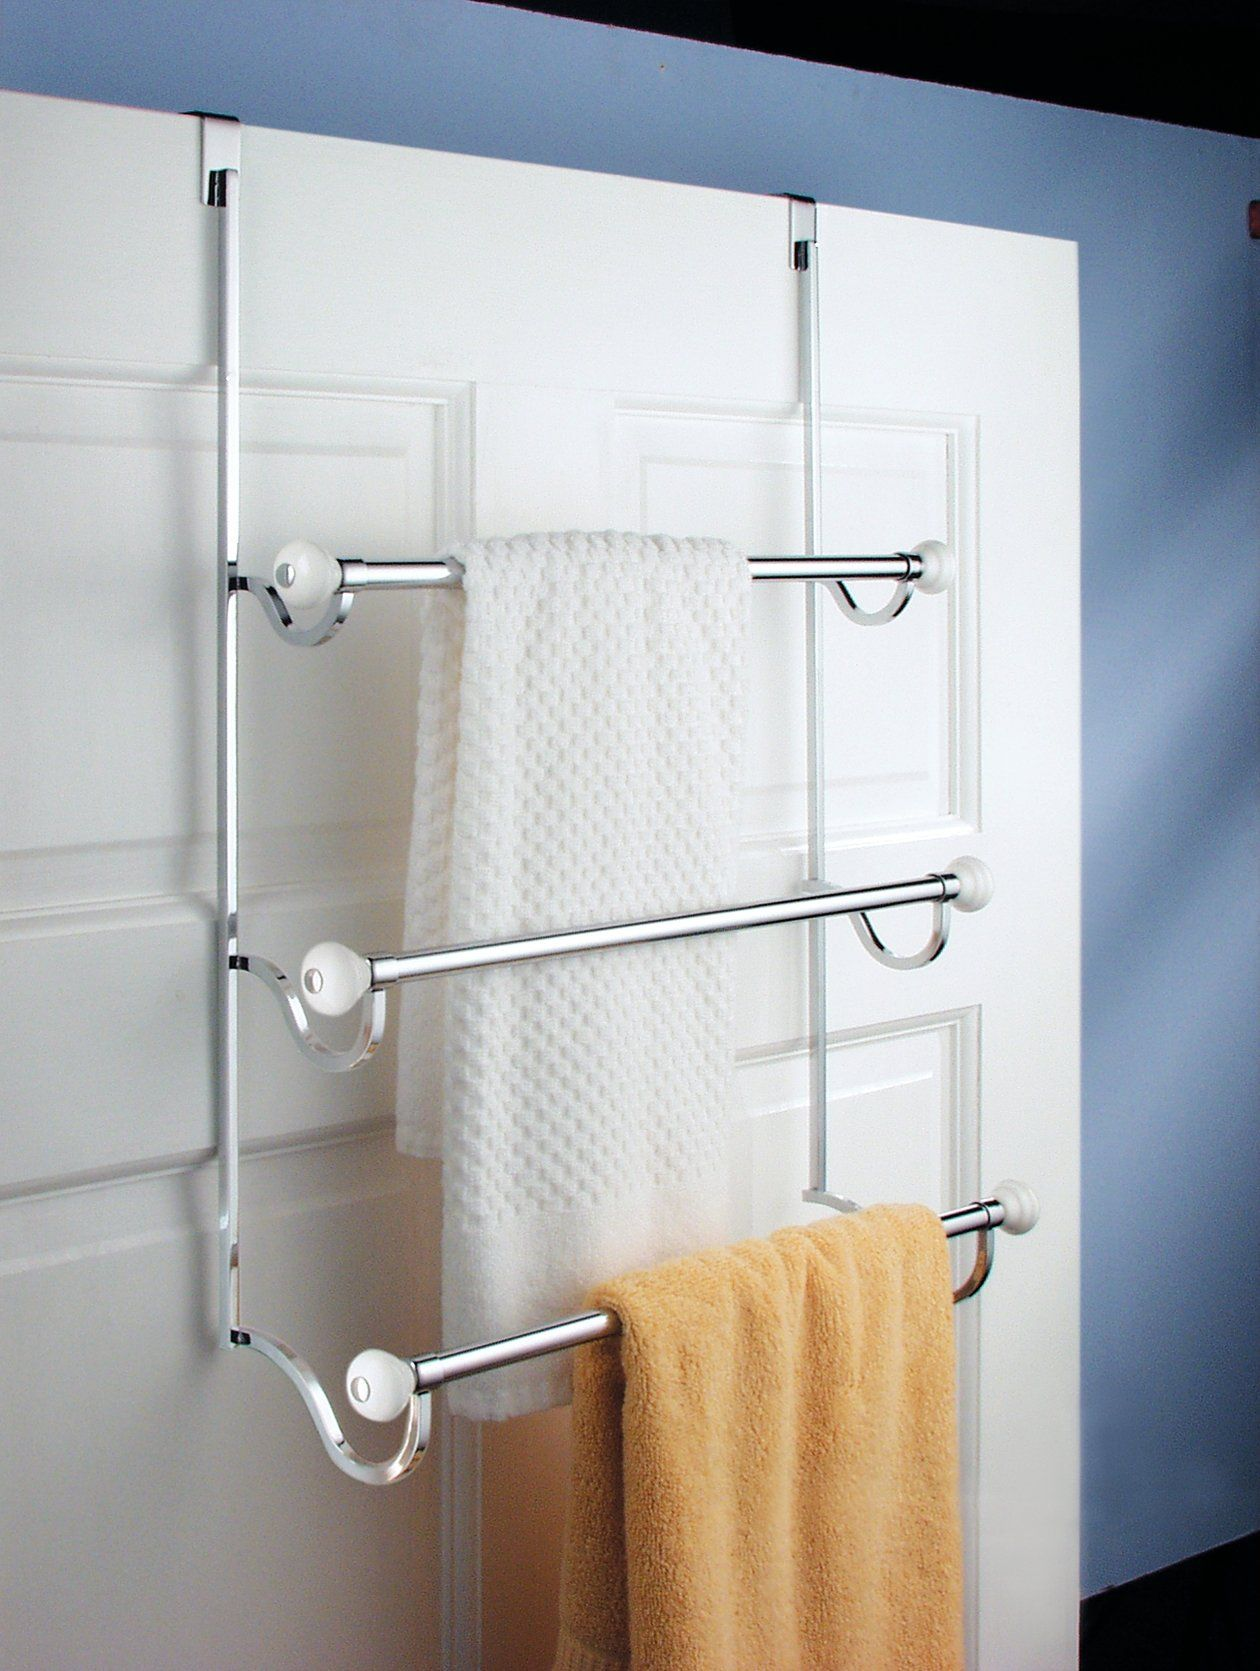 Interdesign York Over The Shower Door 3 Bar Towel Rack White And Chrome